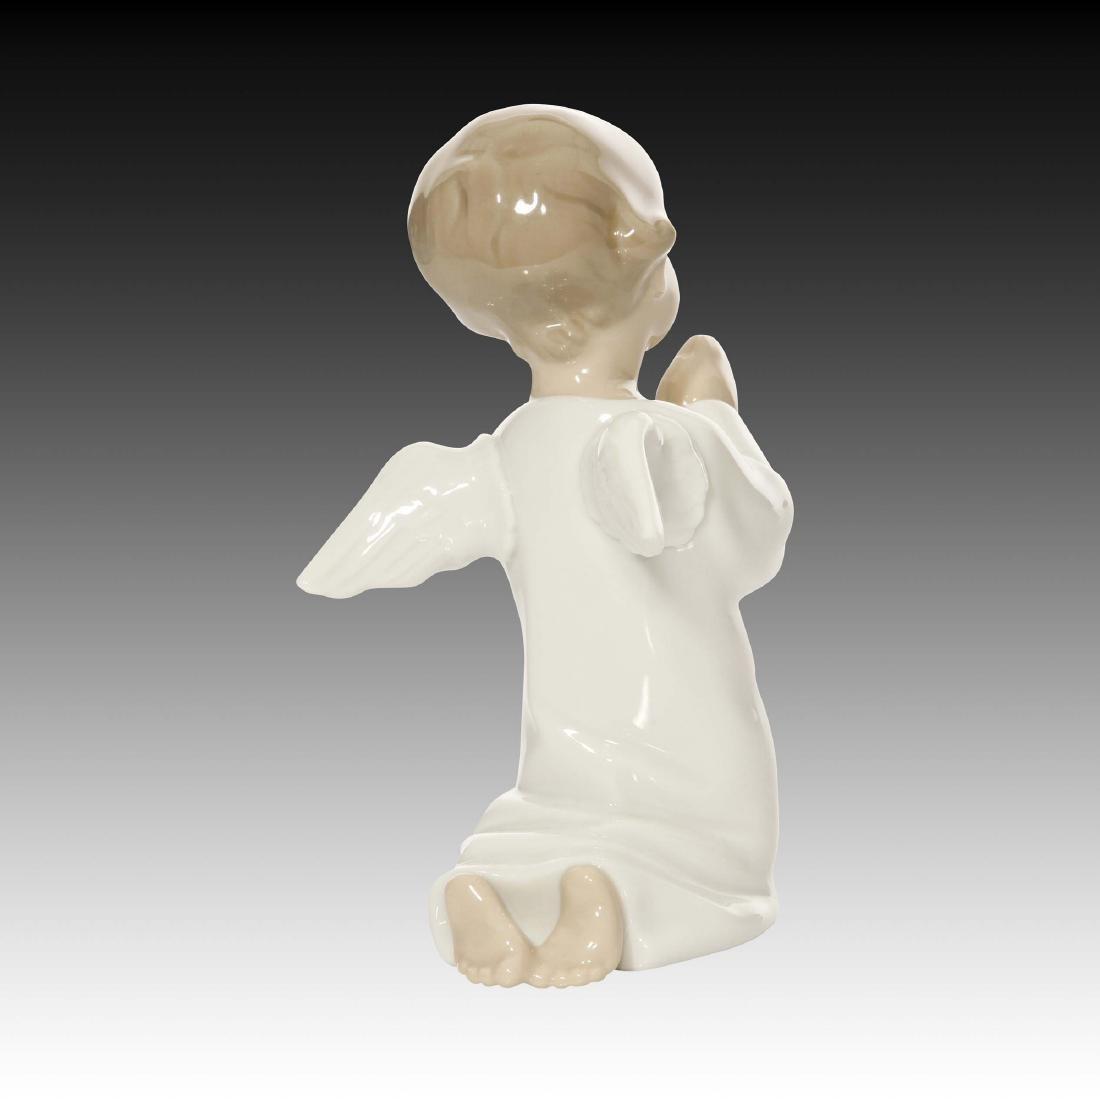 LLADRO ANGEL PRAYING FIGURINE 4538 - 2